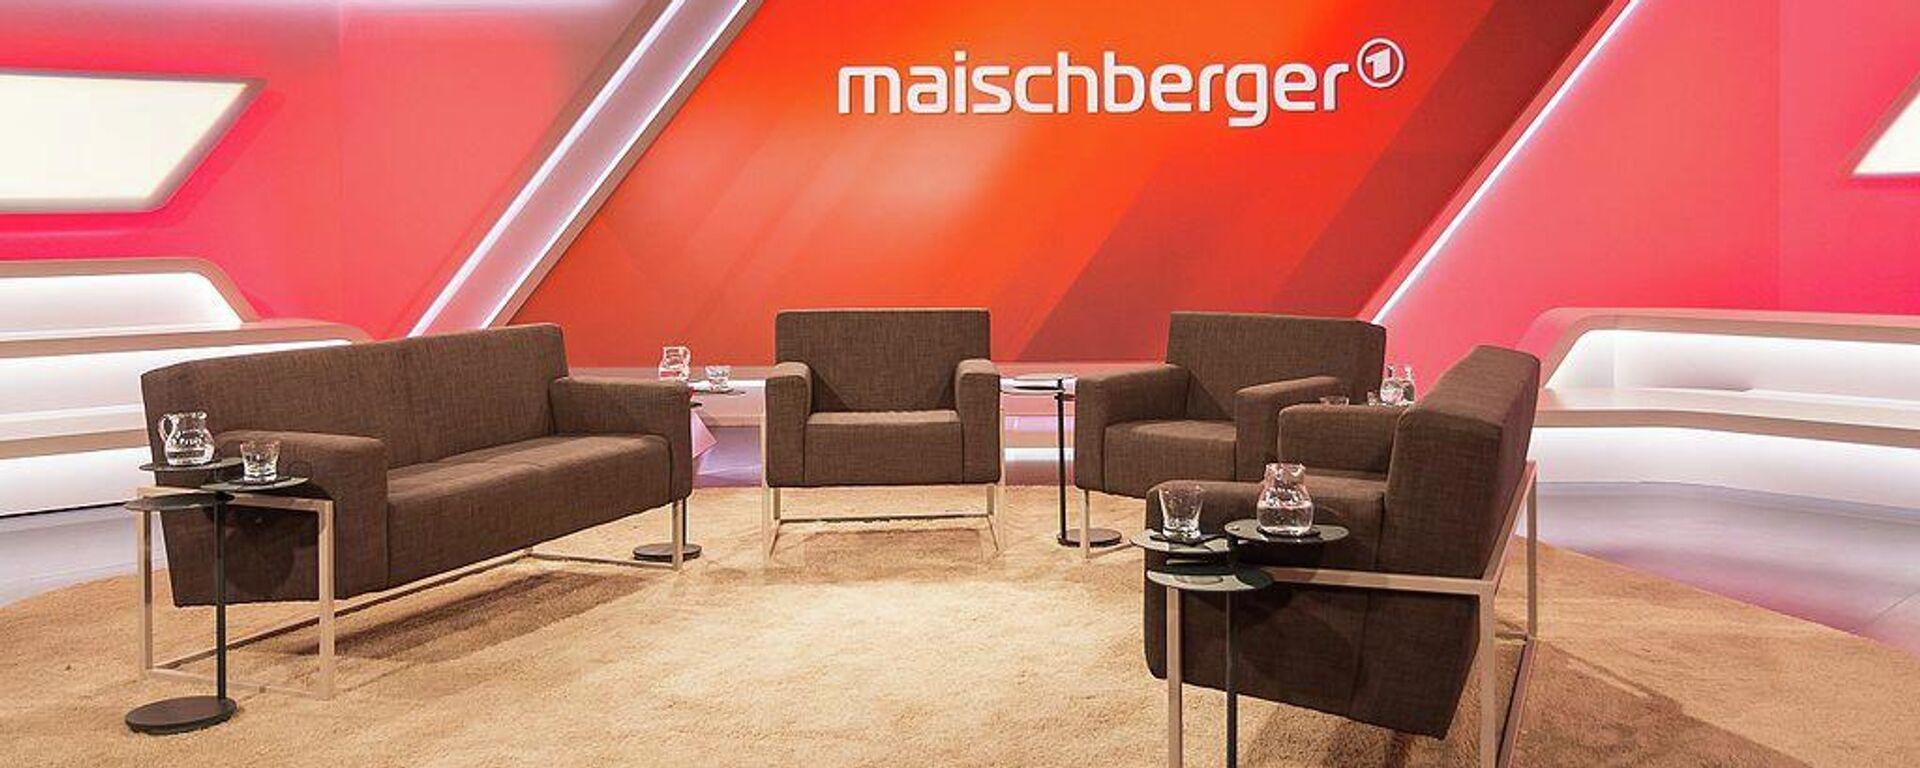 Maischberger-Studio (Archivbild) - SNA, 1920, 29.04.2021